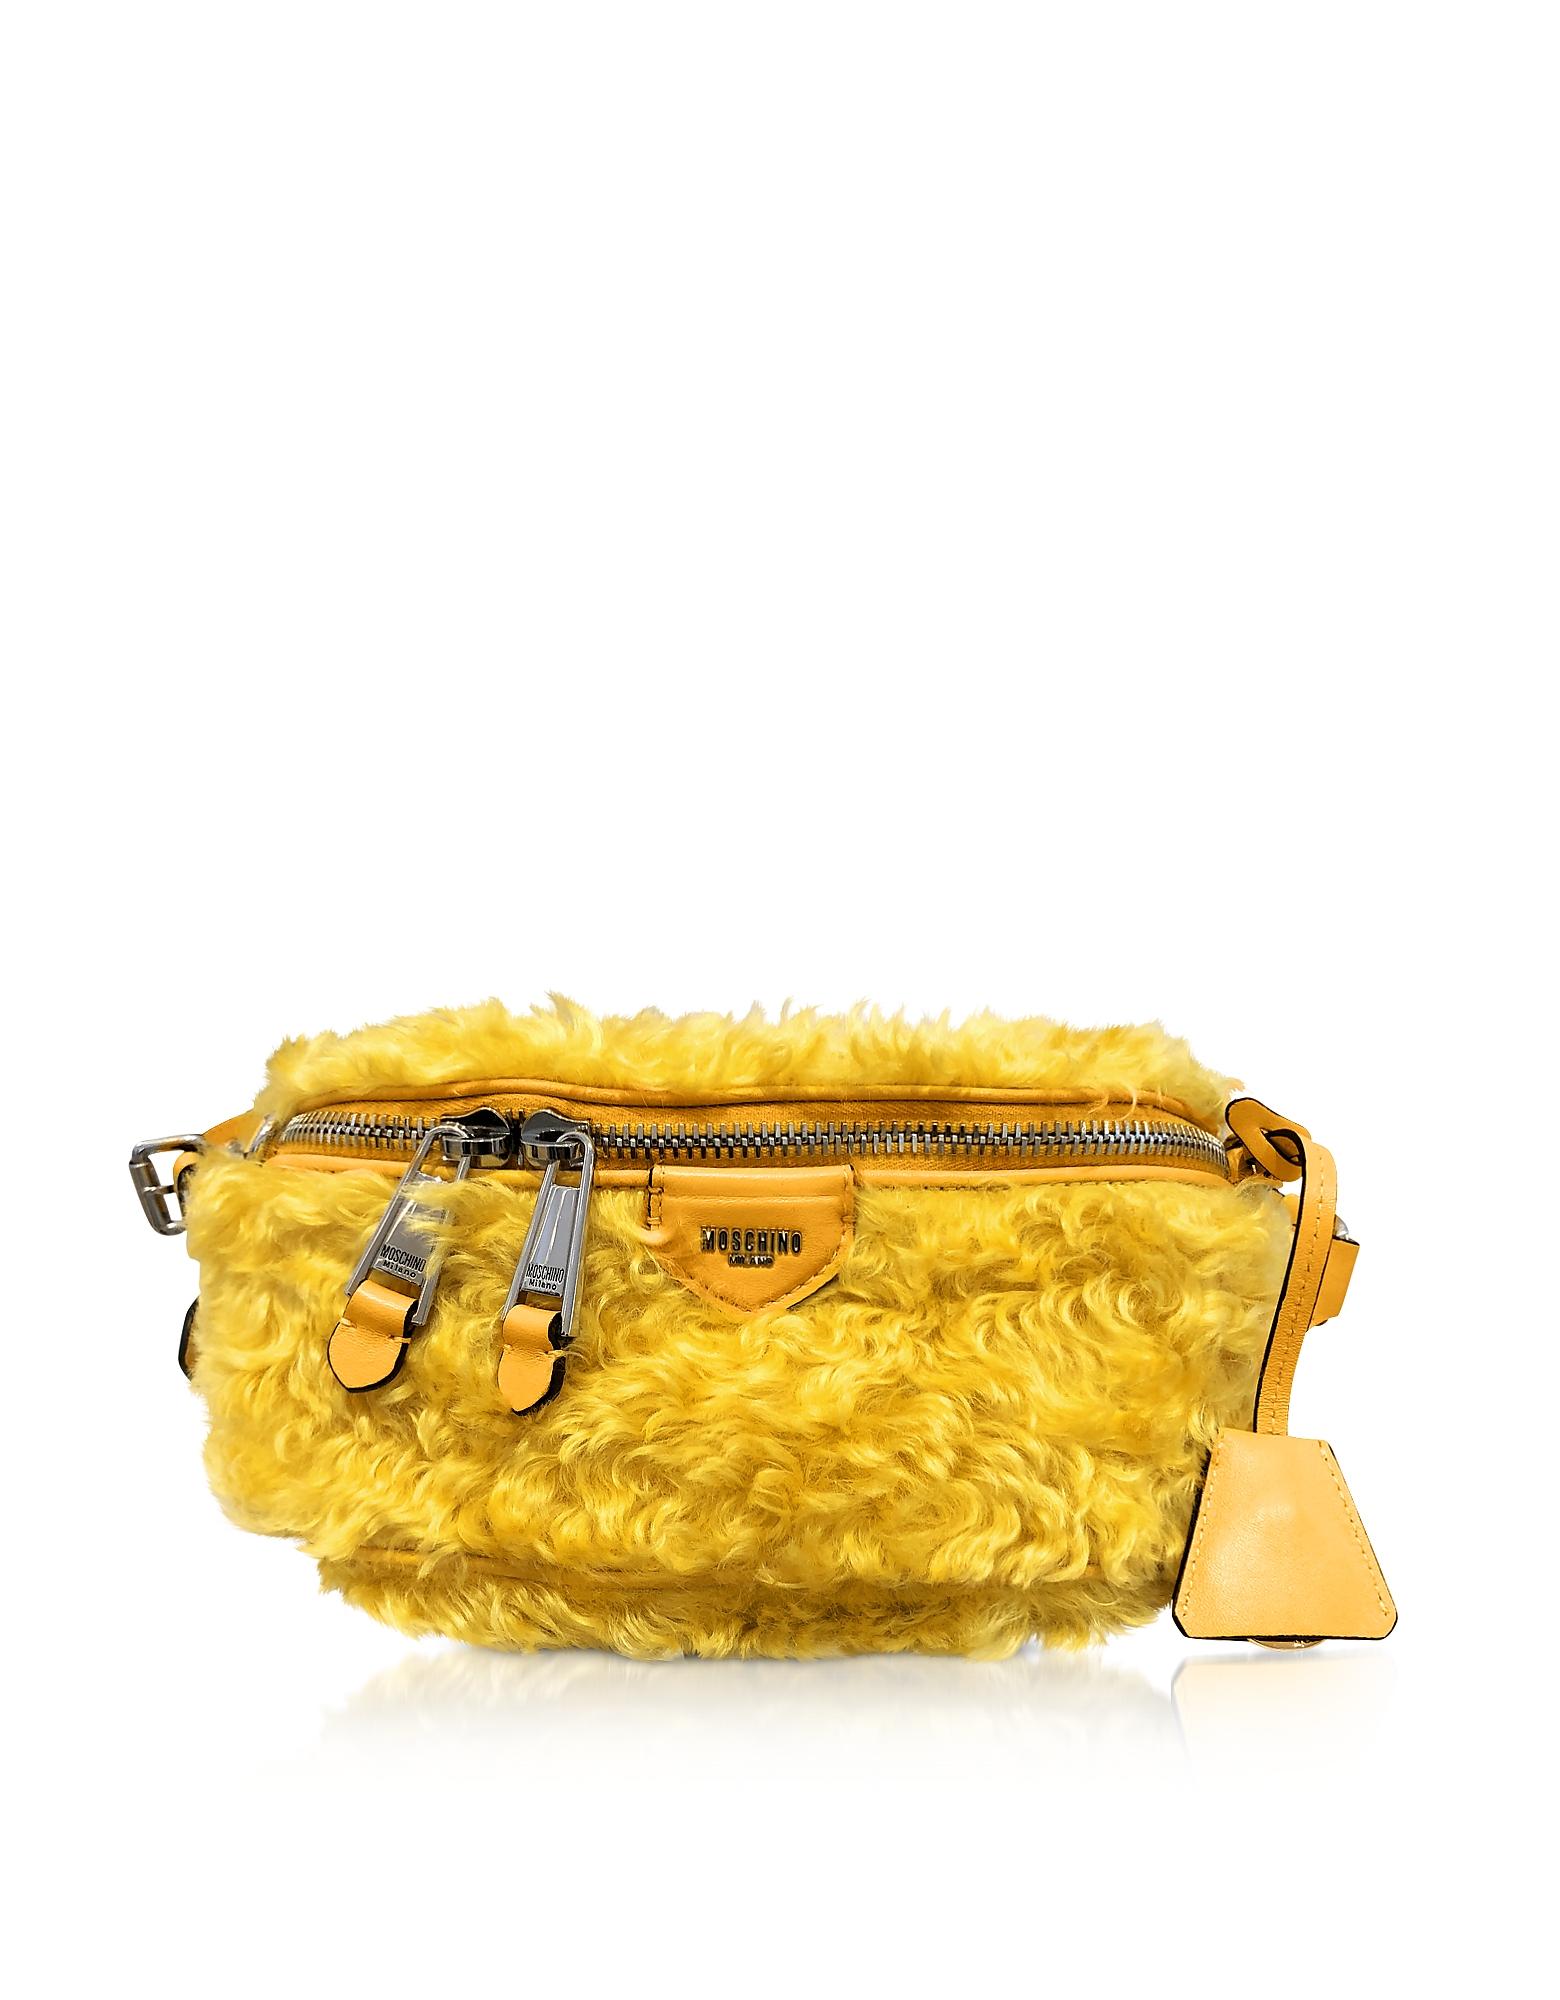 Moschino Handbags, Yellow Mohair Belt Bag